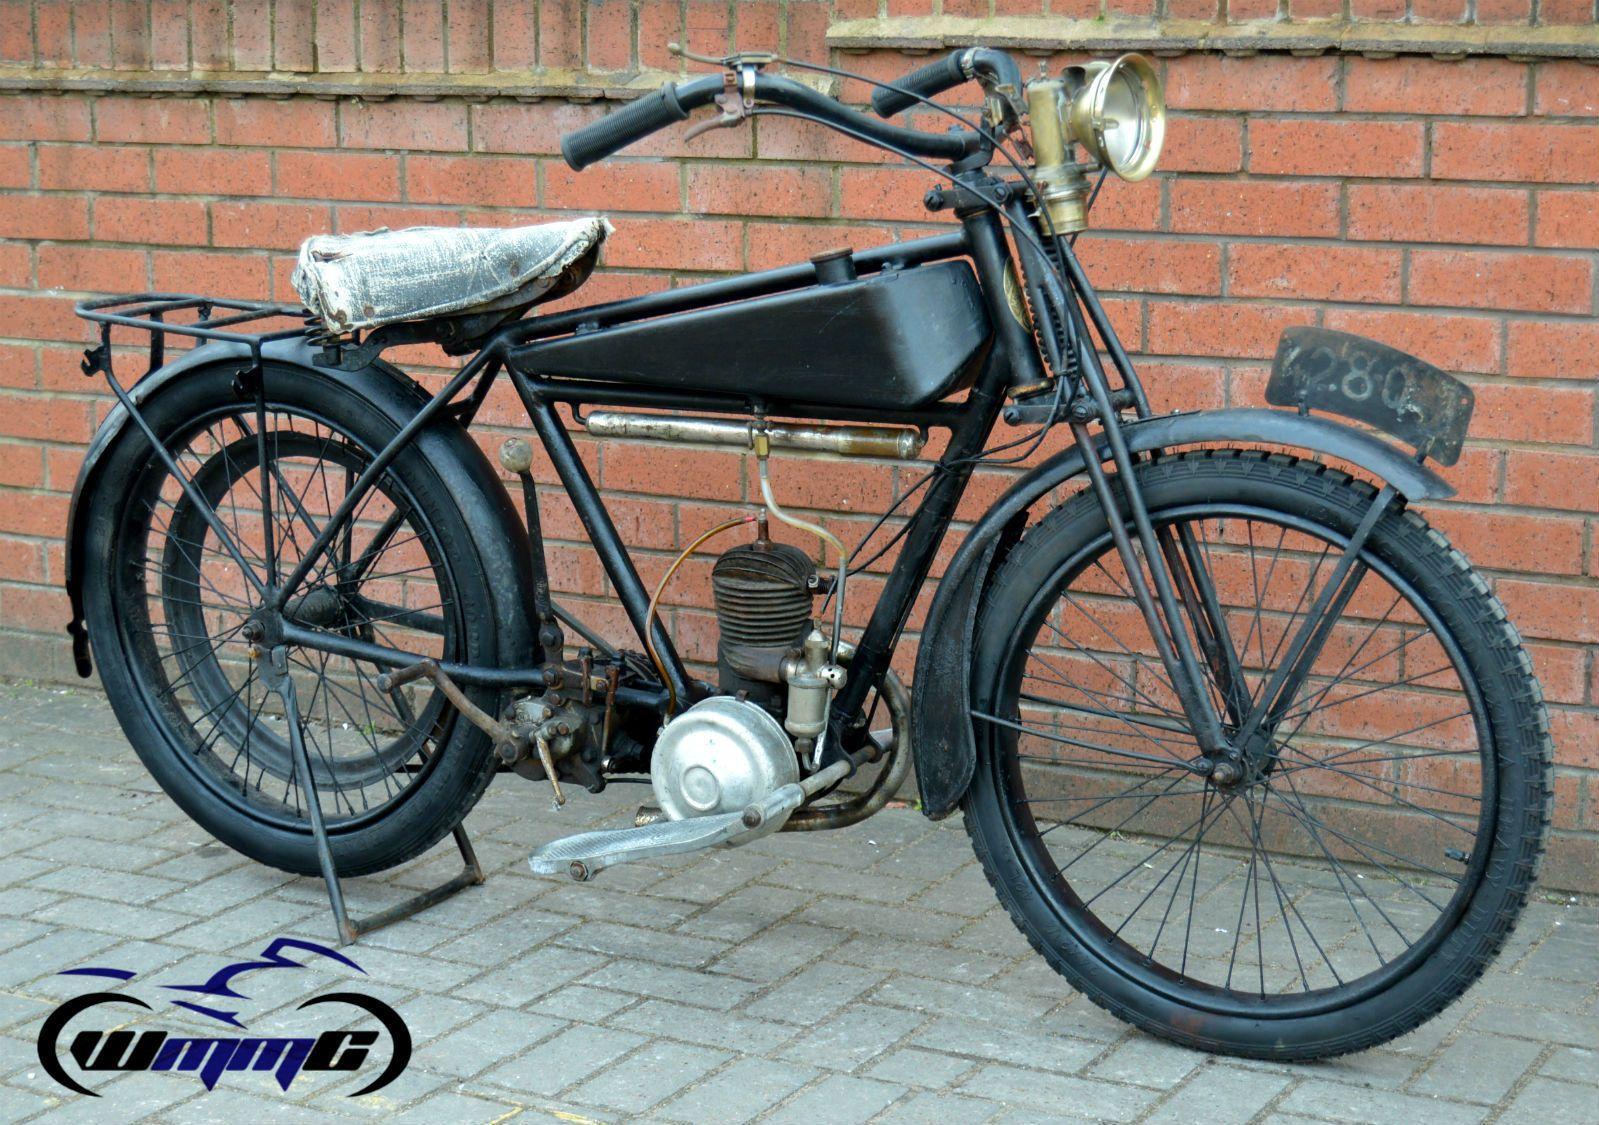 1926 Monet Goyon Type Z 147cc Villiers French Classic Vintage Old Motorcycles Classic Motorcycles French Classic